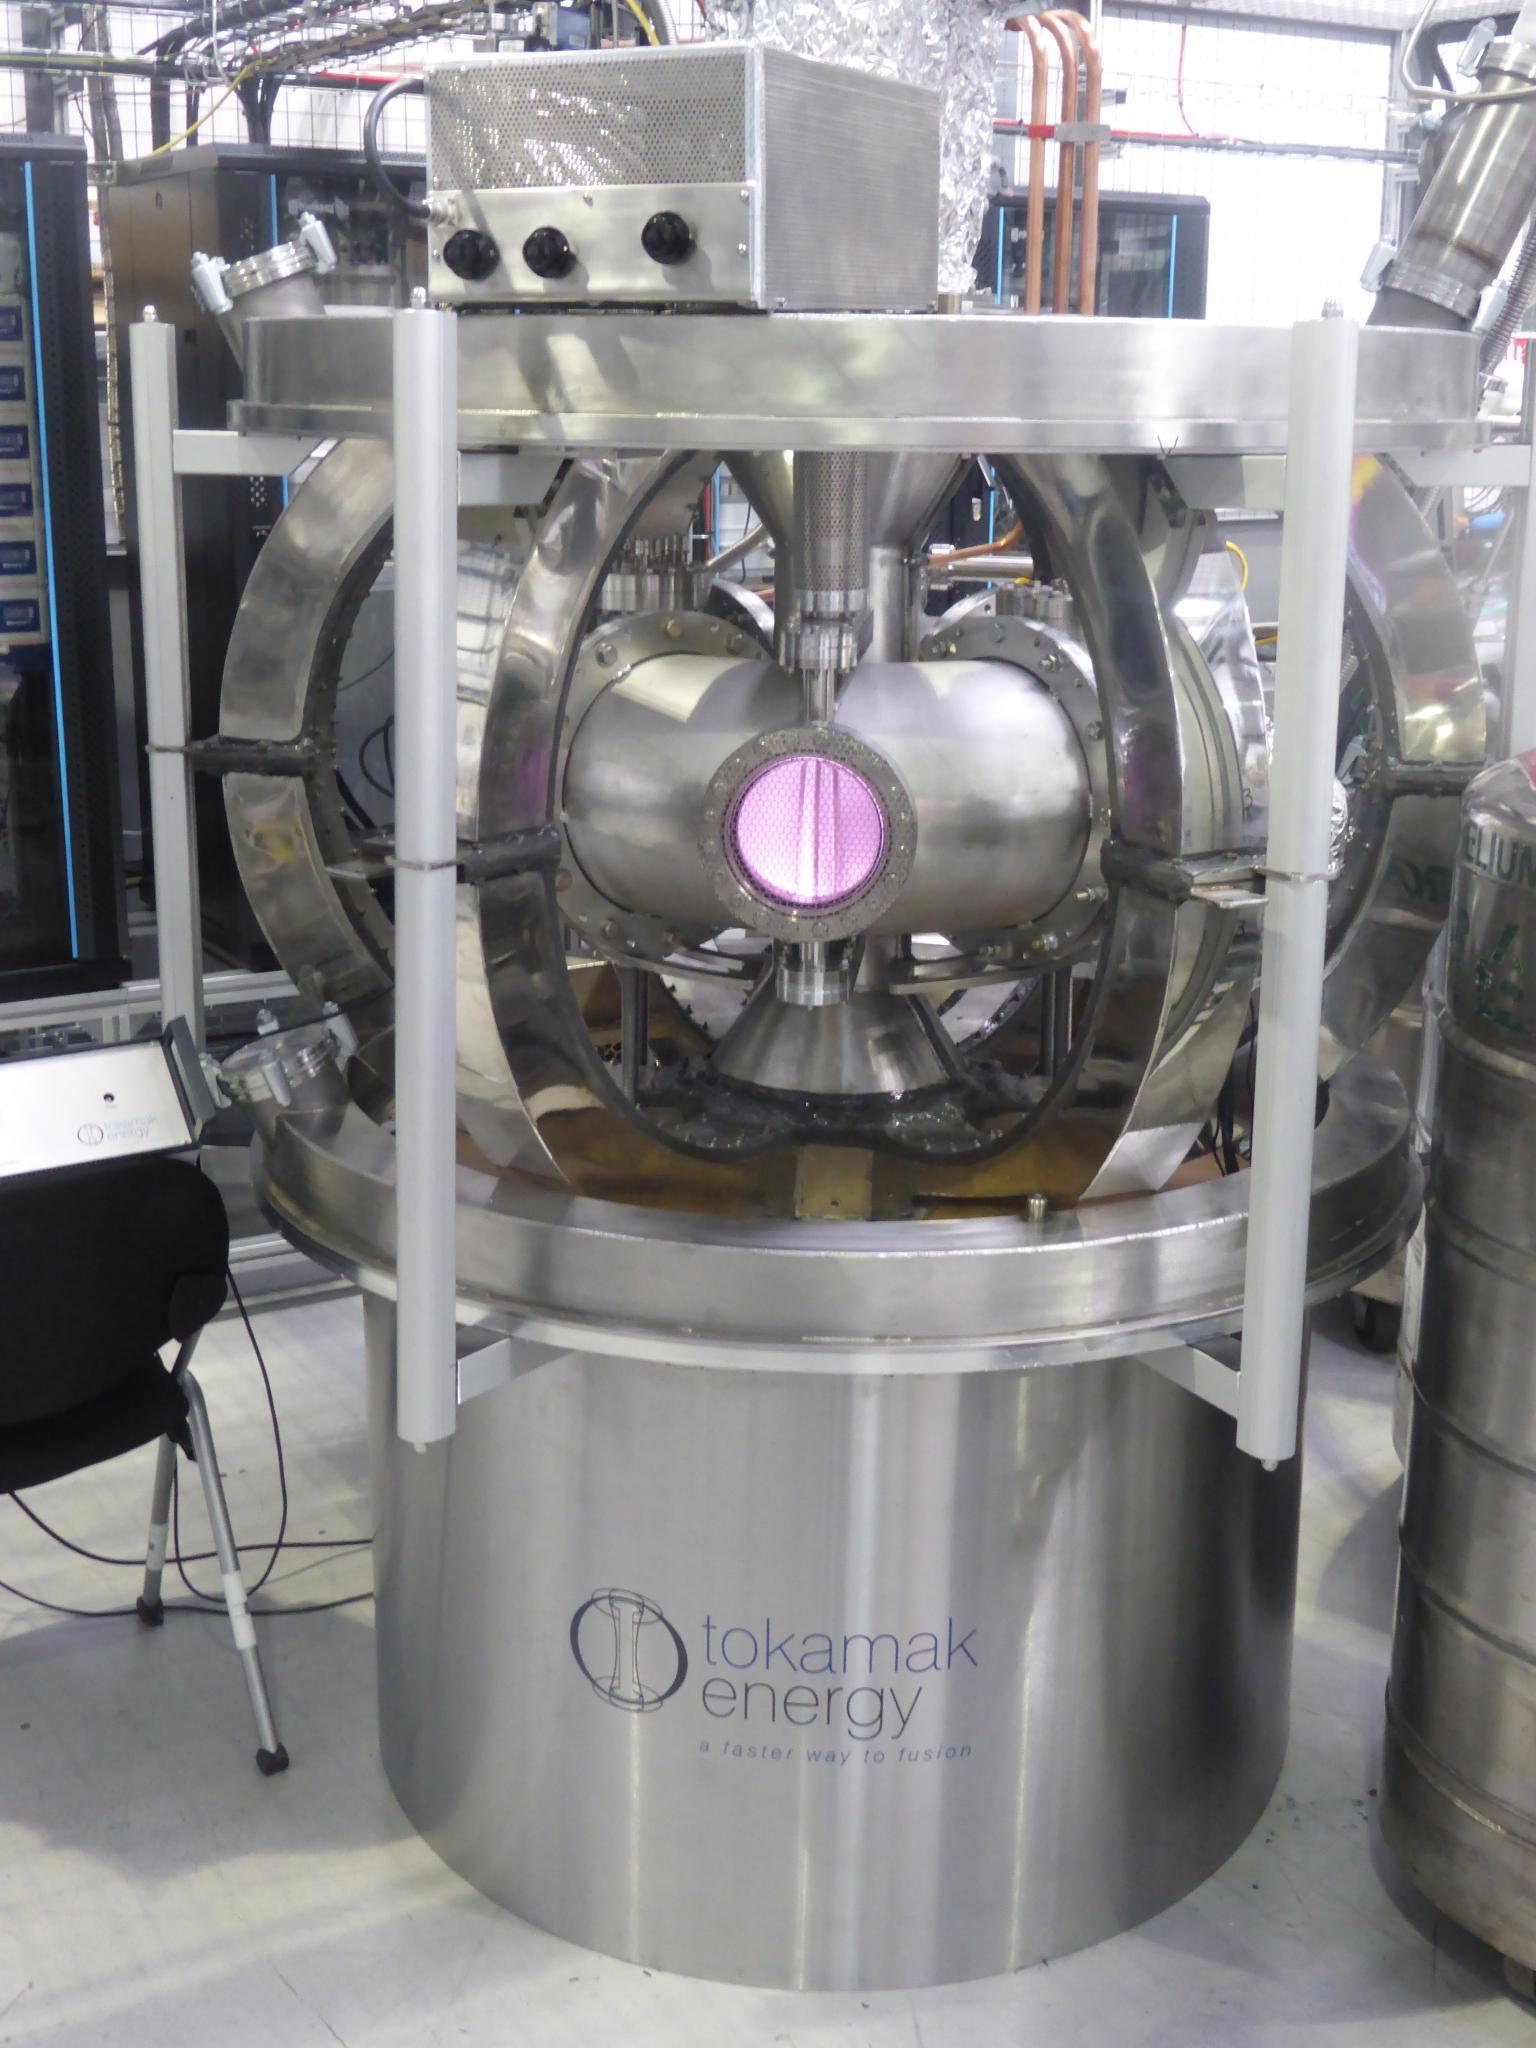 Hydrogen plasma in Tokamak Energy's HTS tokamak